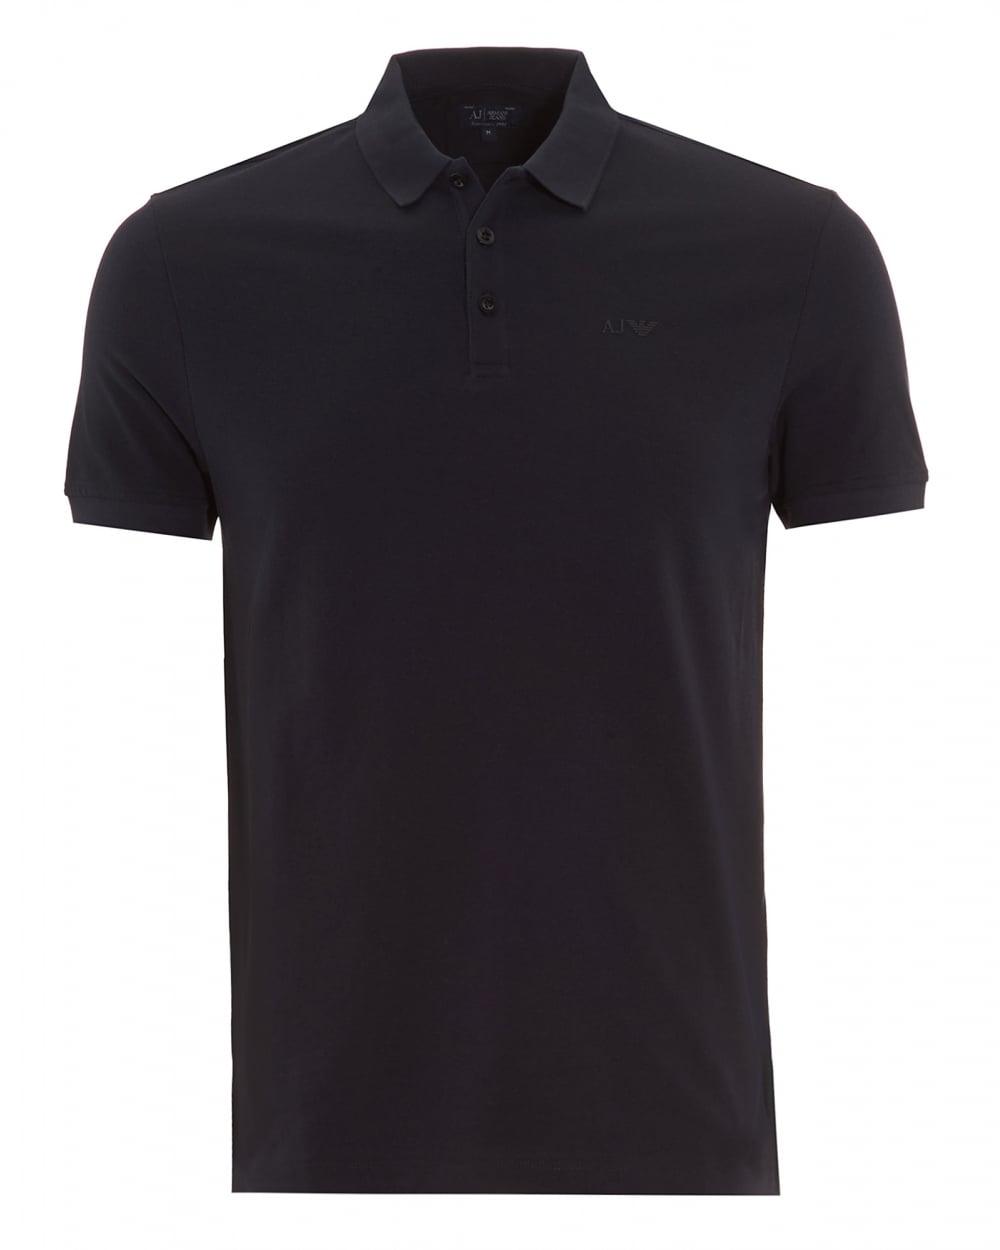 armani jeans mens polo shirt plain navy blue short sleeve polo